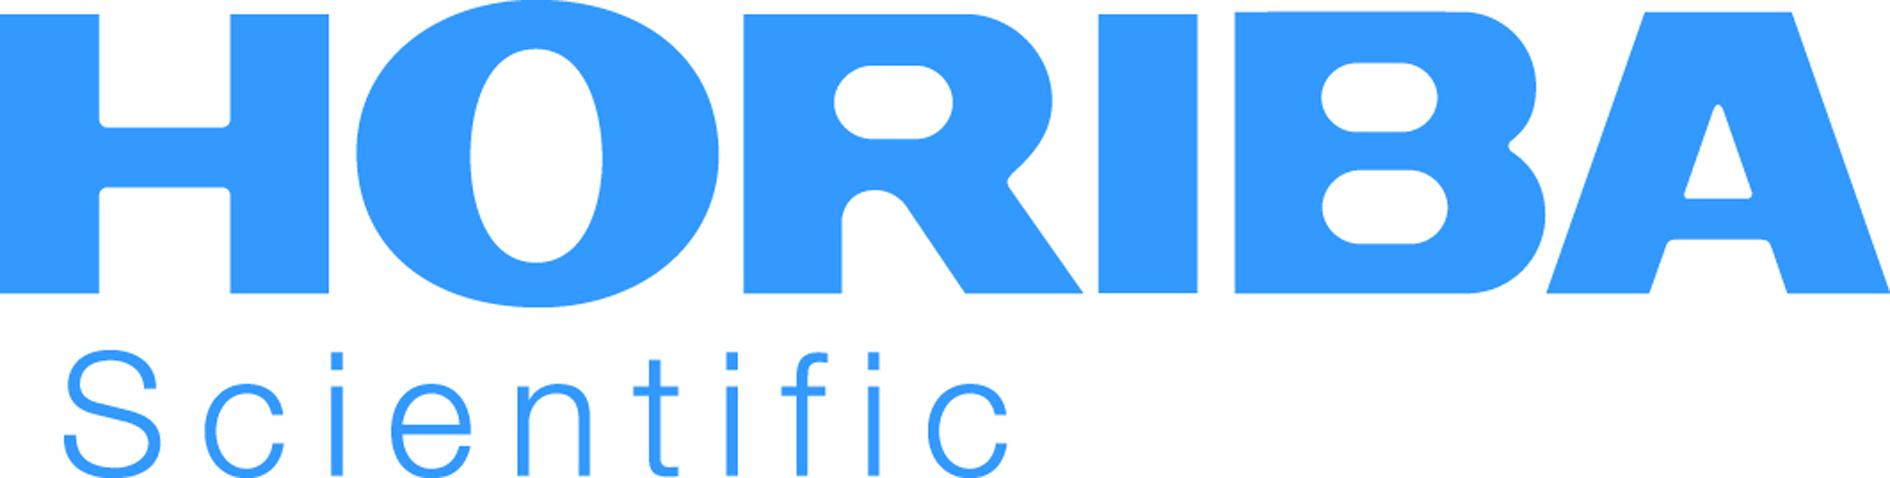 HORIBA Scientific HD